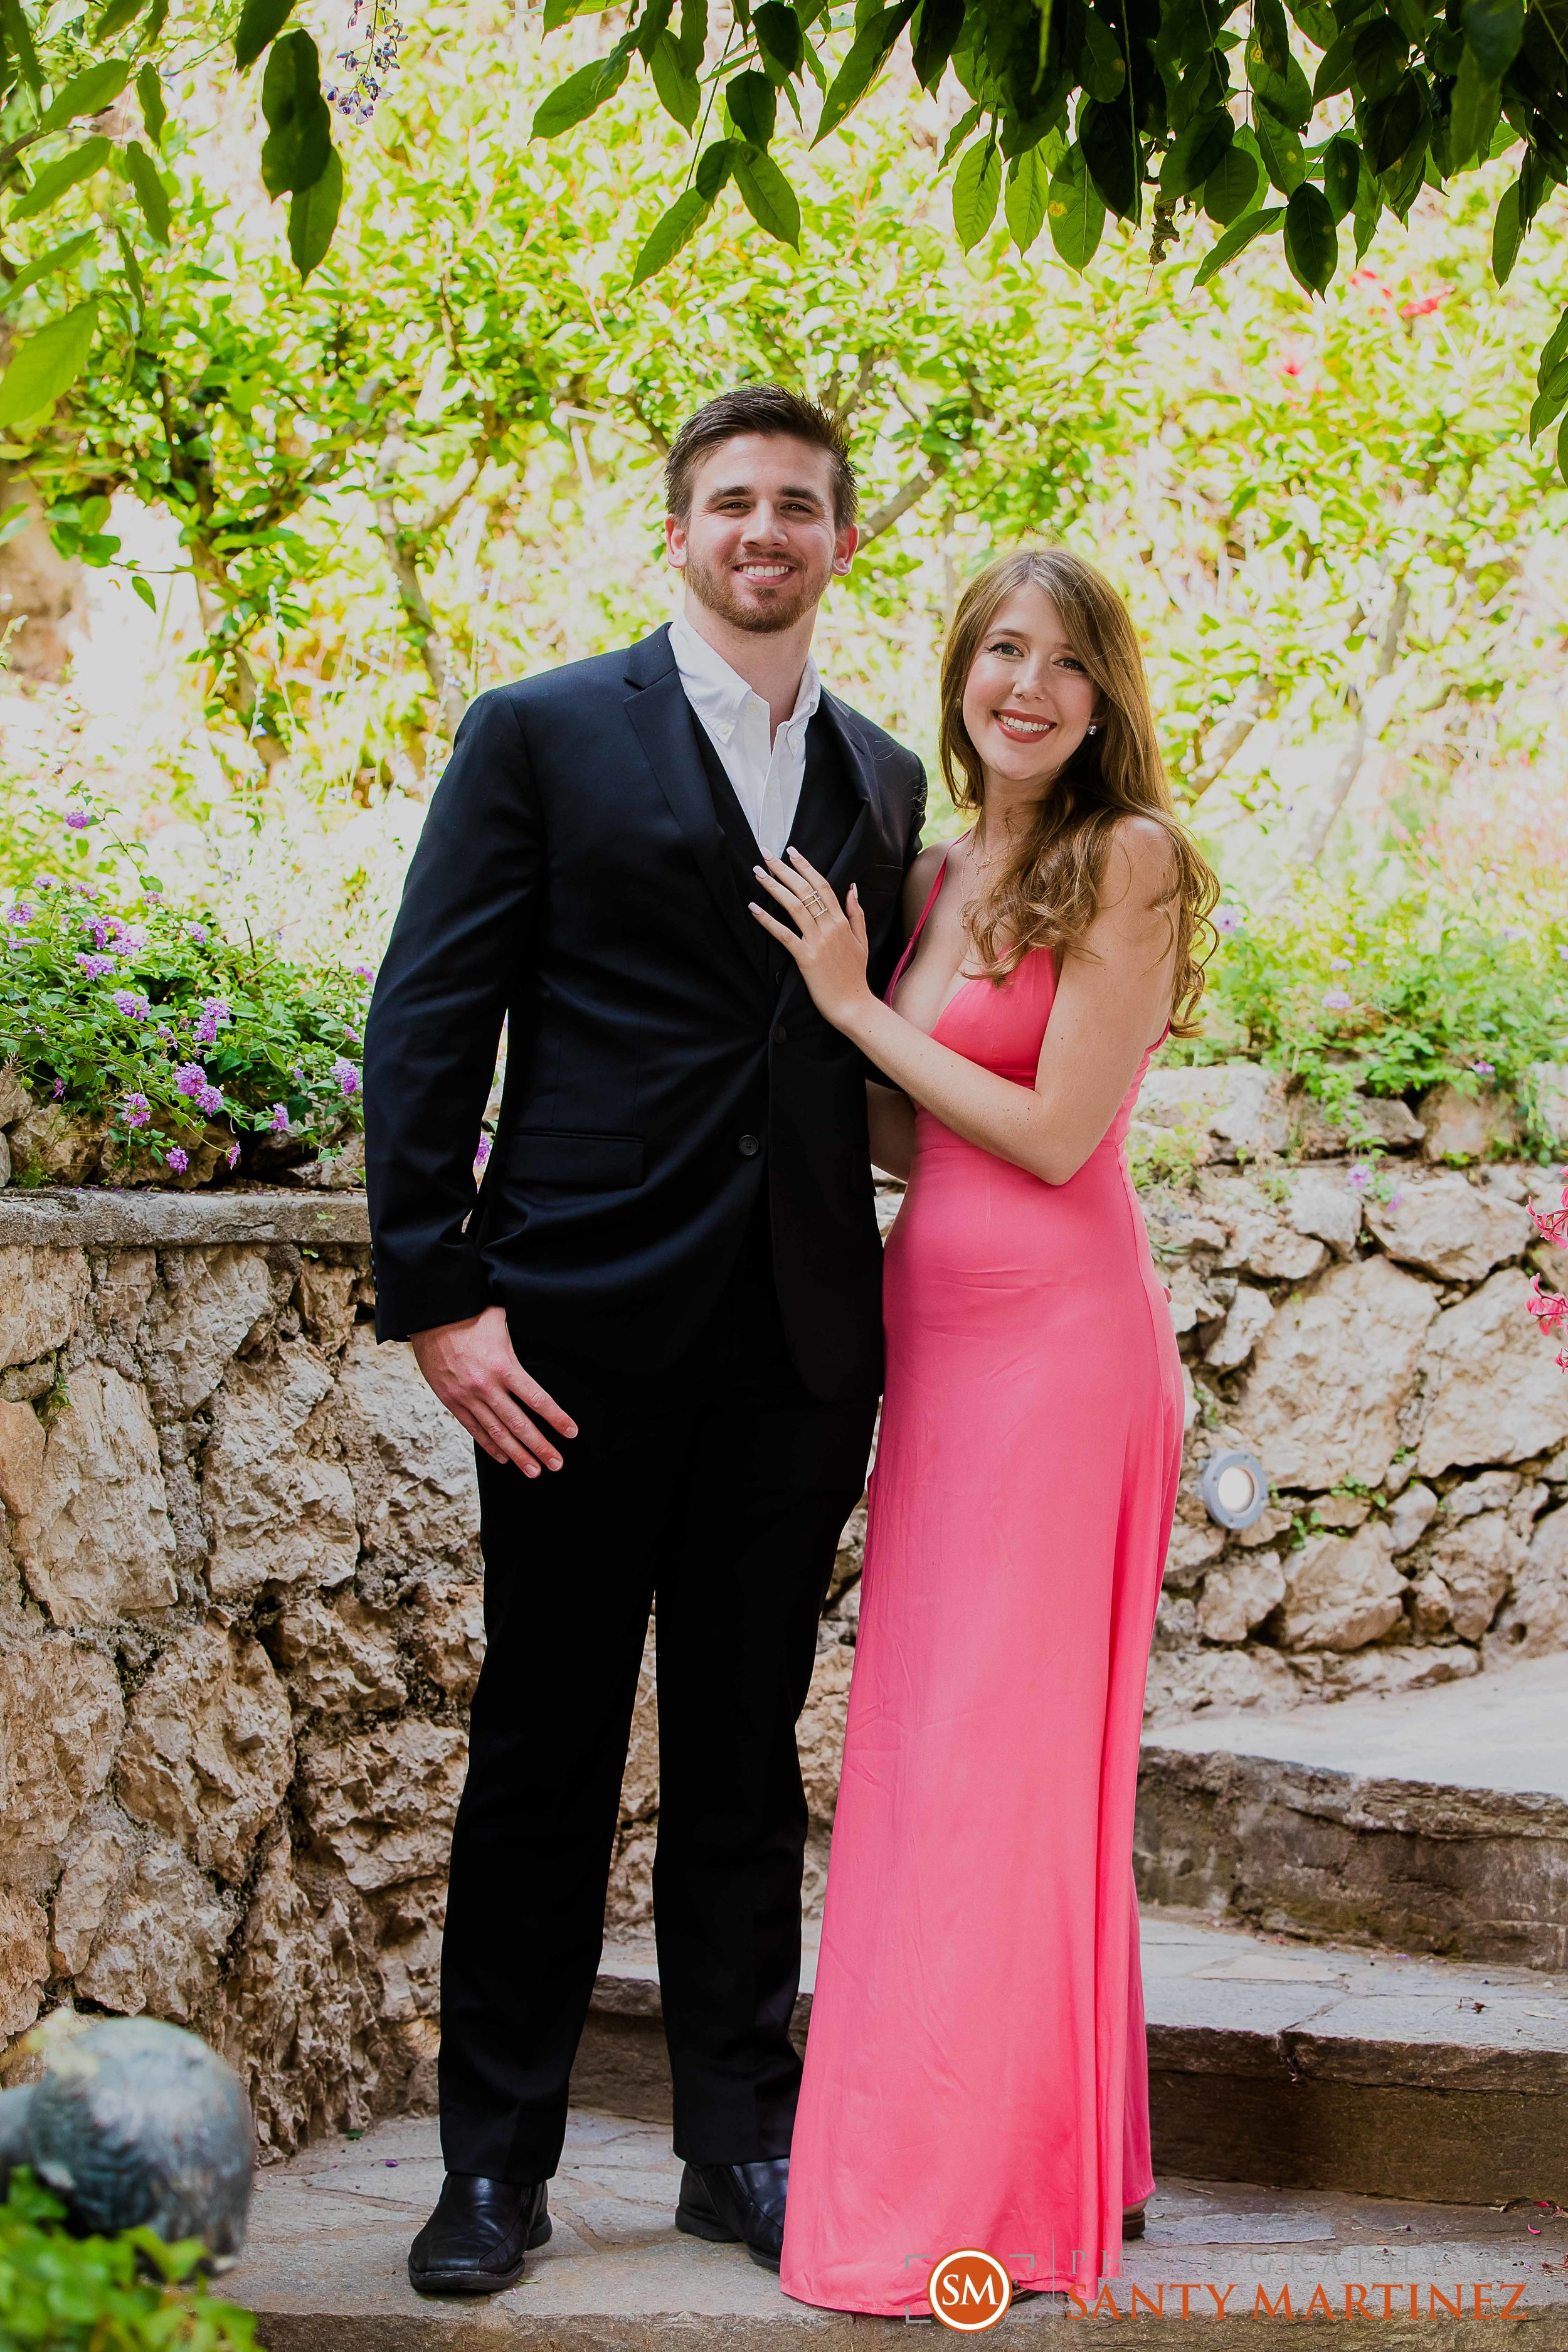 Wedding Capri Italy - Photography by Santy Martinez-22.jpg